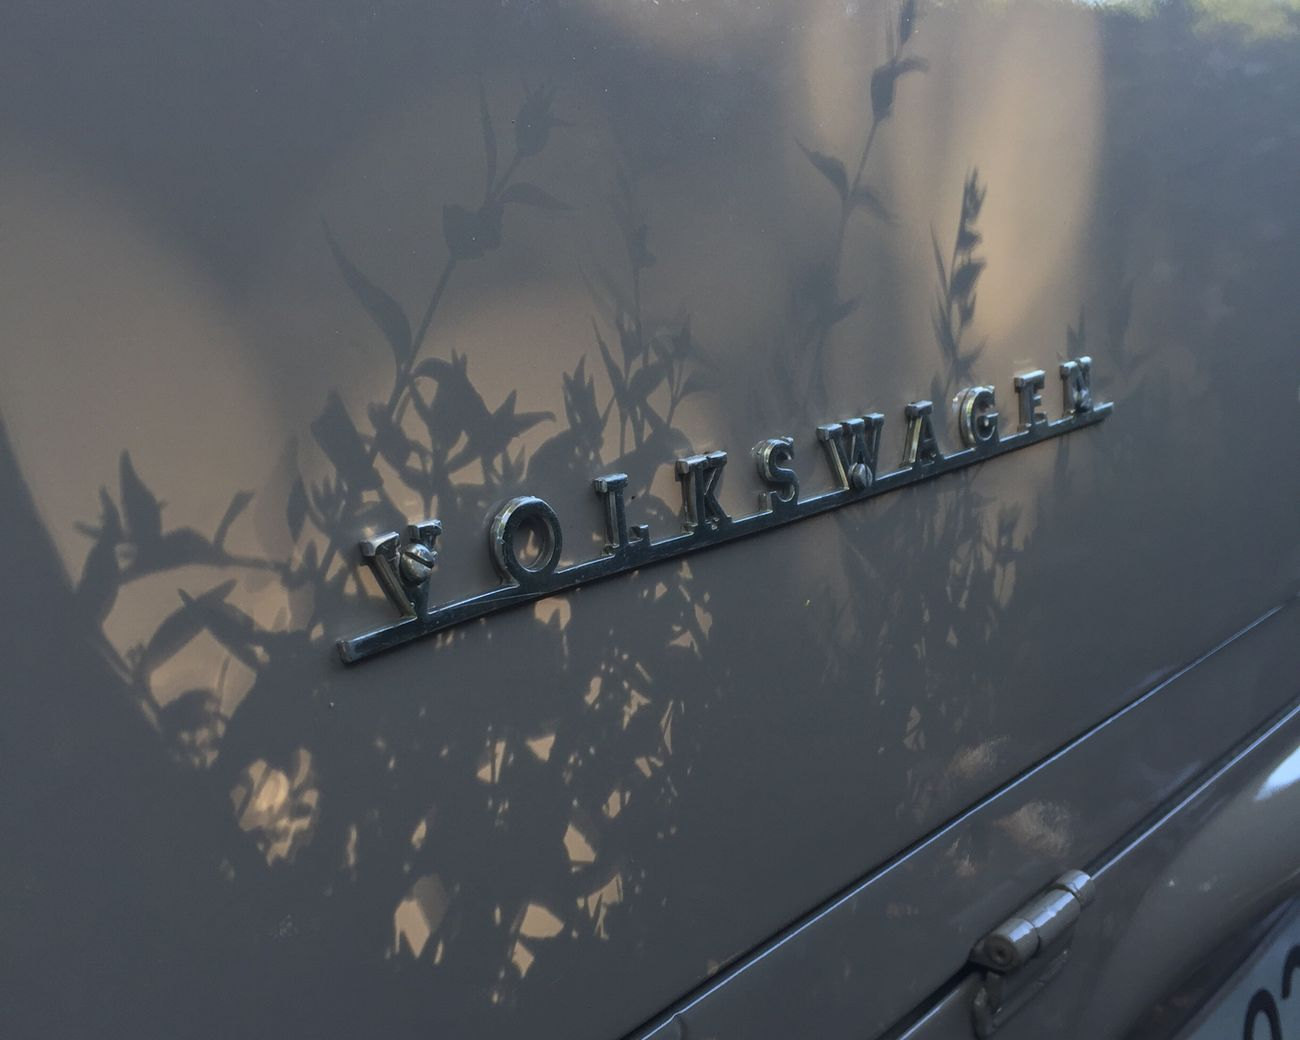 IPhoneography Taking Photos Cars Volkswagenbus Caravelle  Volkswagen Nofilter#noedit